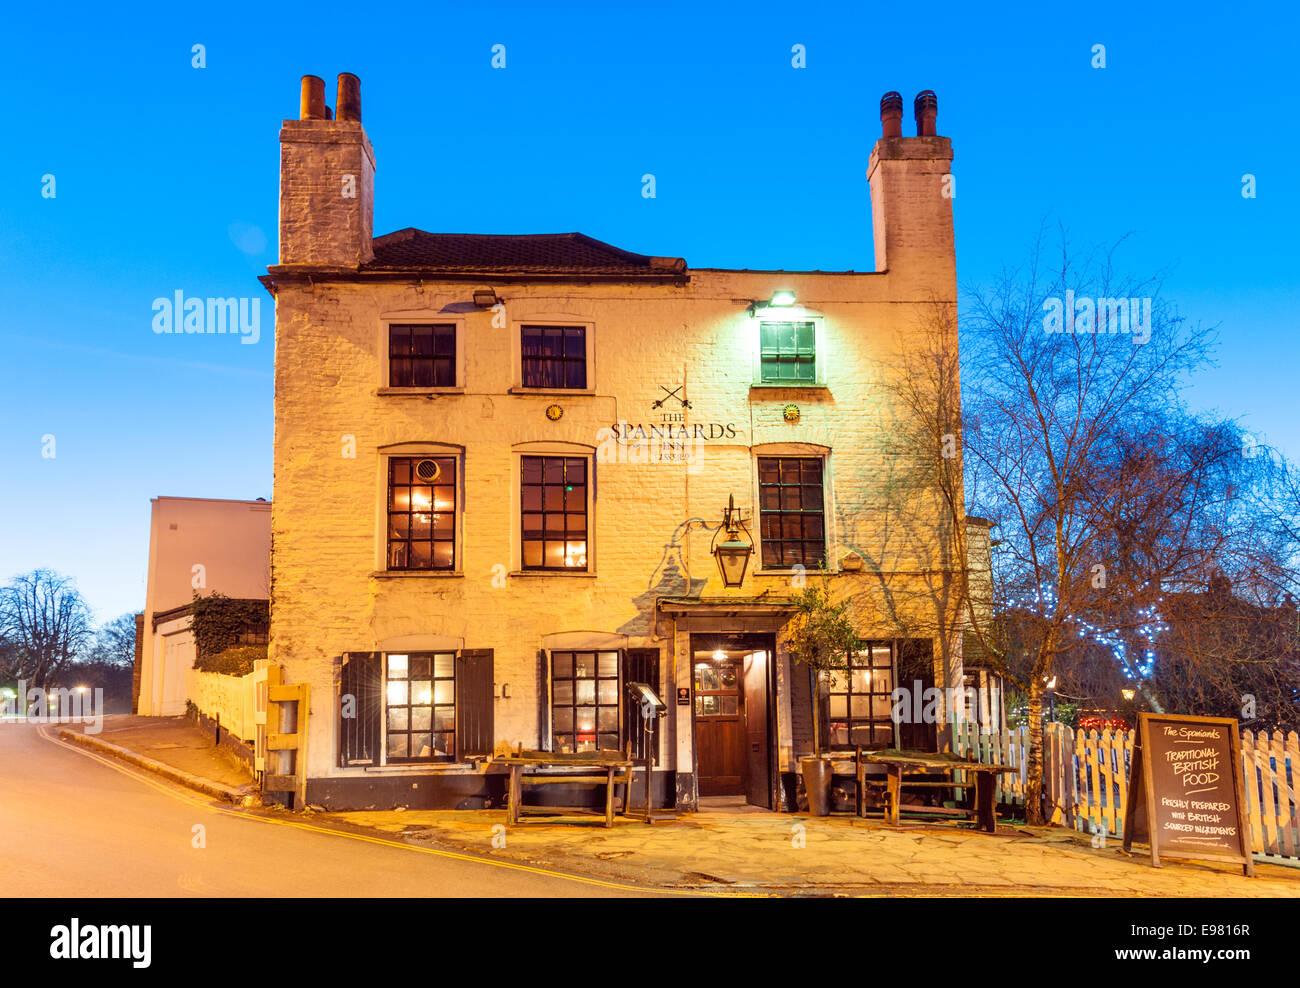 The Spaniards Inn, Hampstead, London, England, UK - Stock Image